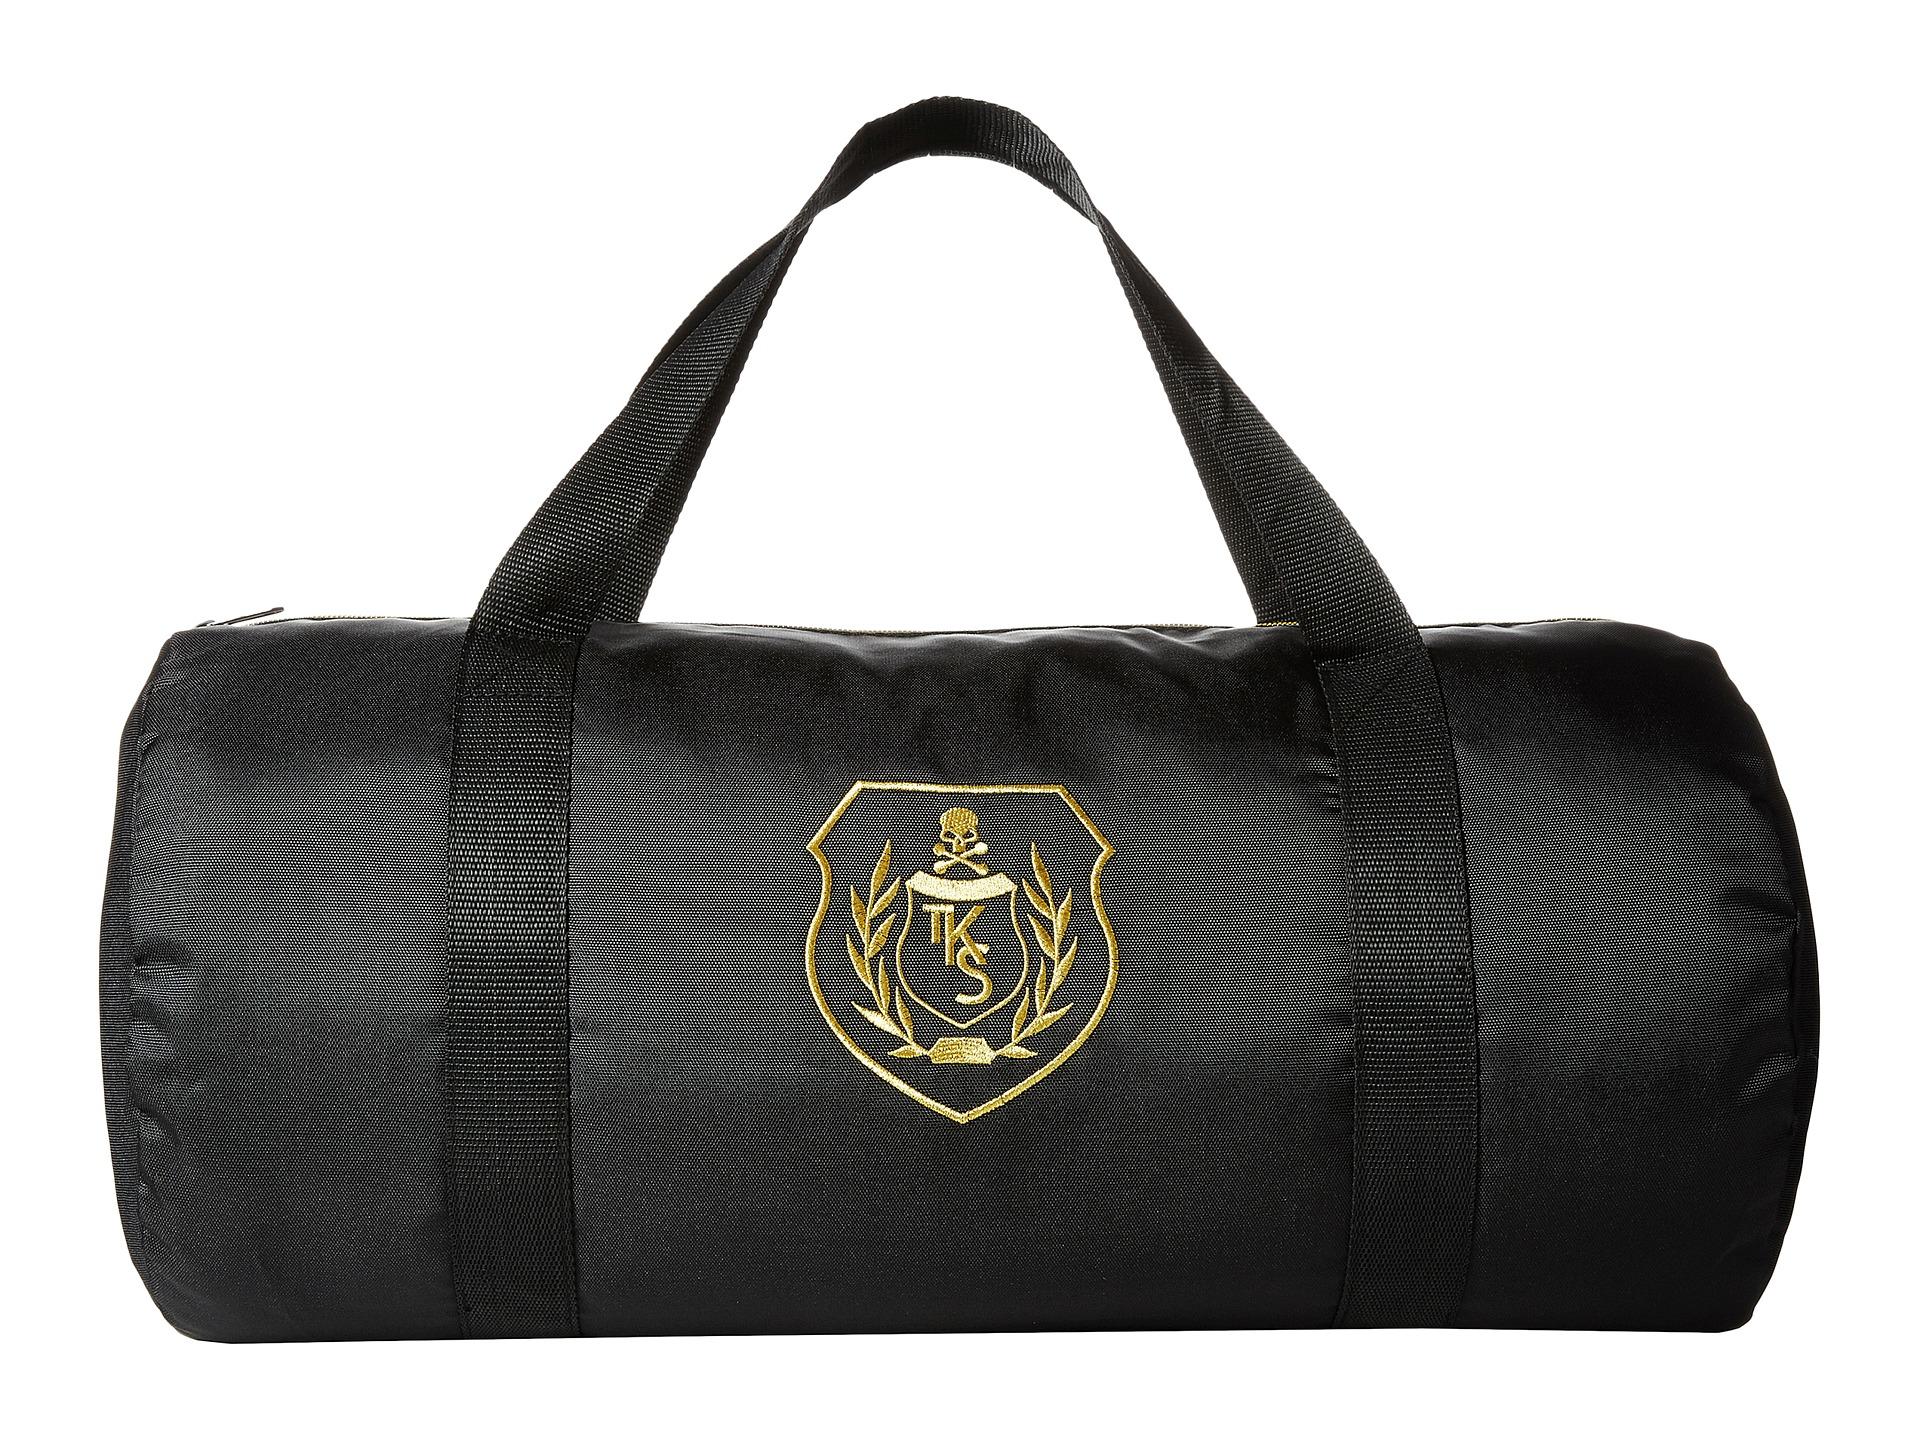 963b63ba64 Lyst - The Kooples Sport Classic Dots Duffel Bag in Black for Men